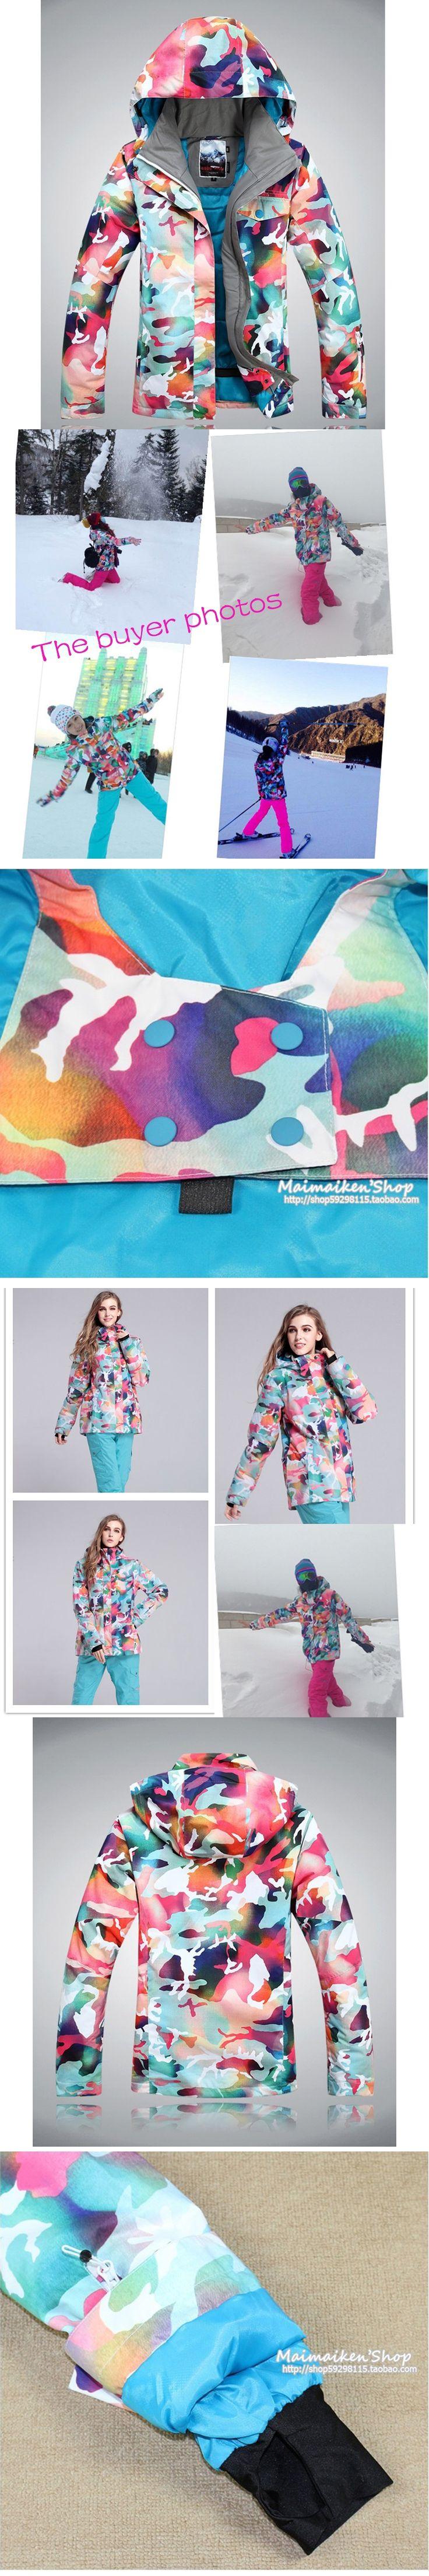 Free shipping skiing jacket snowboarding jacket waterproof women snow suit for women jacket Mountaineering warm coat